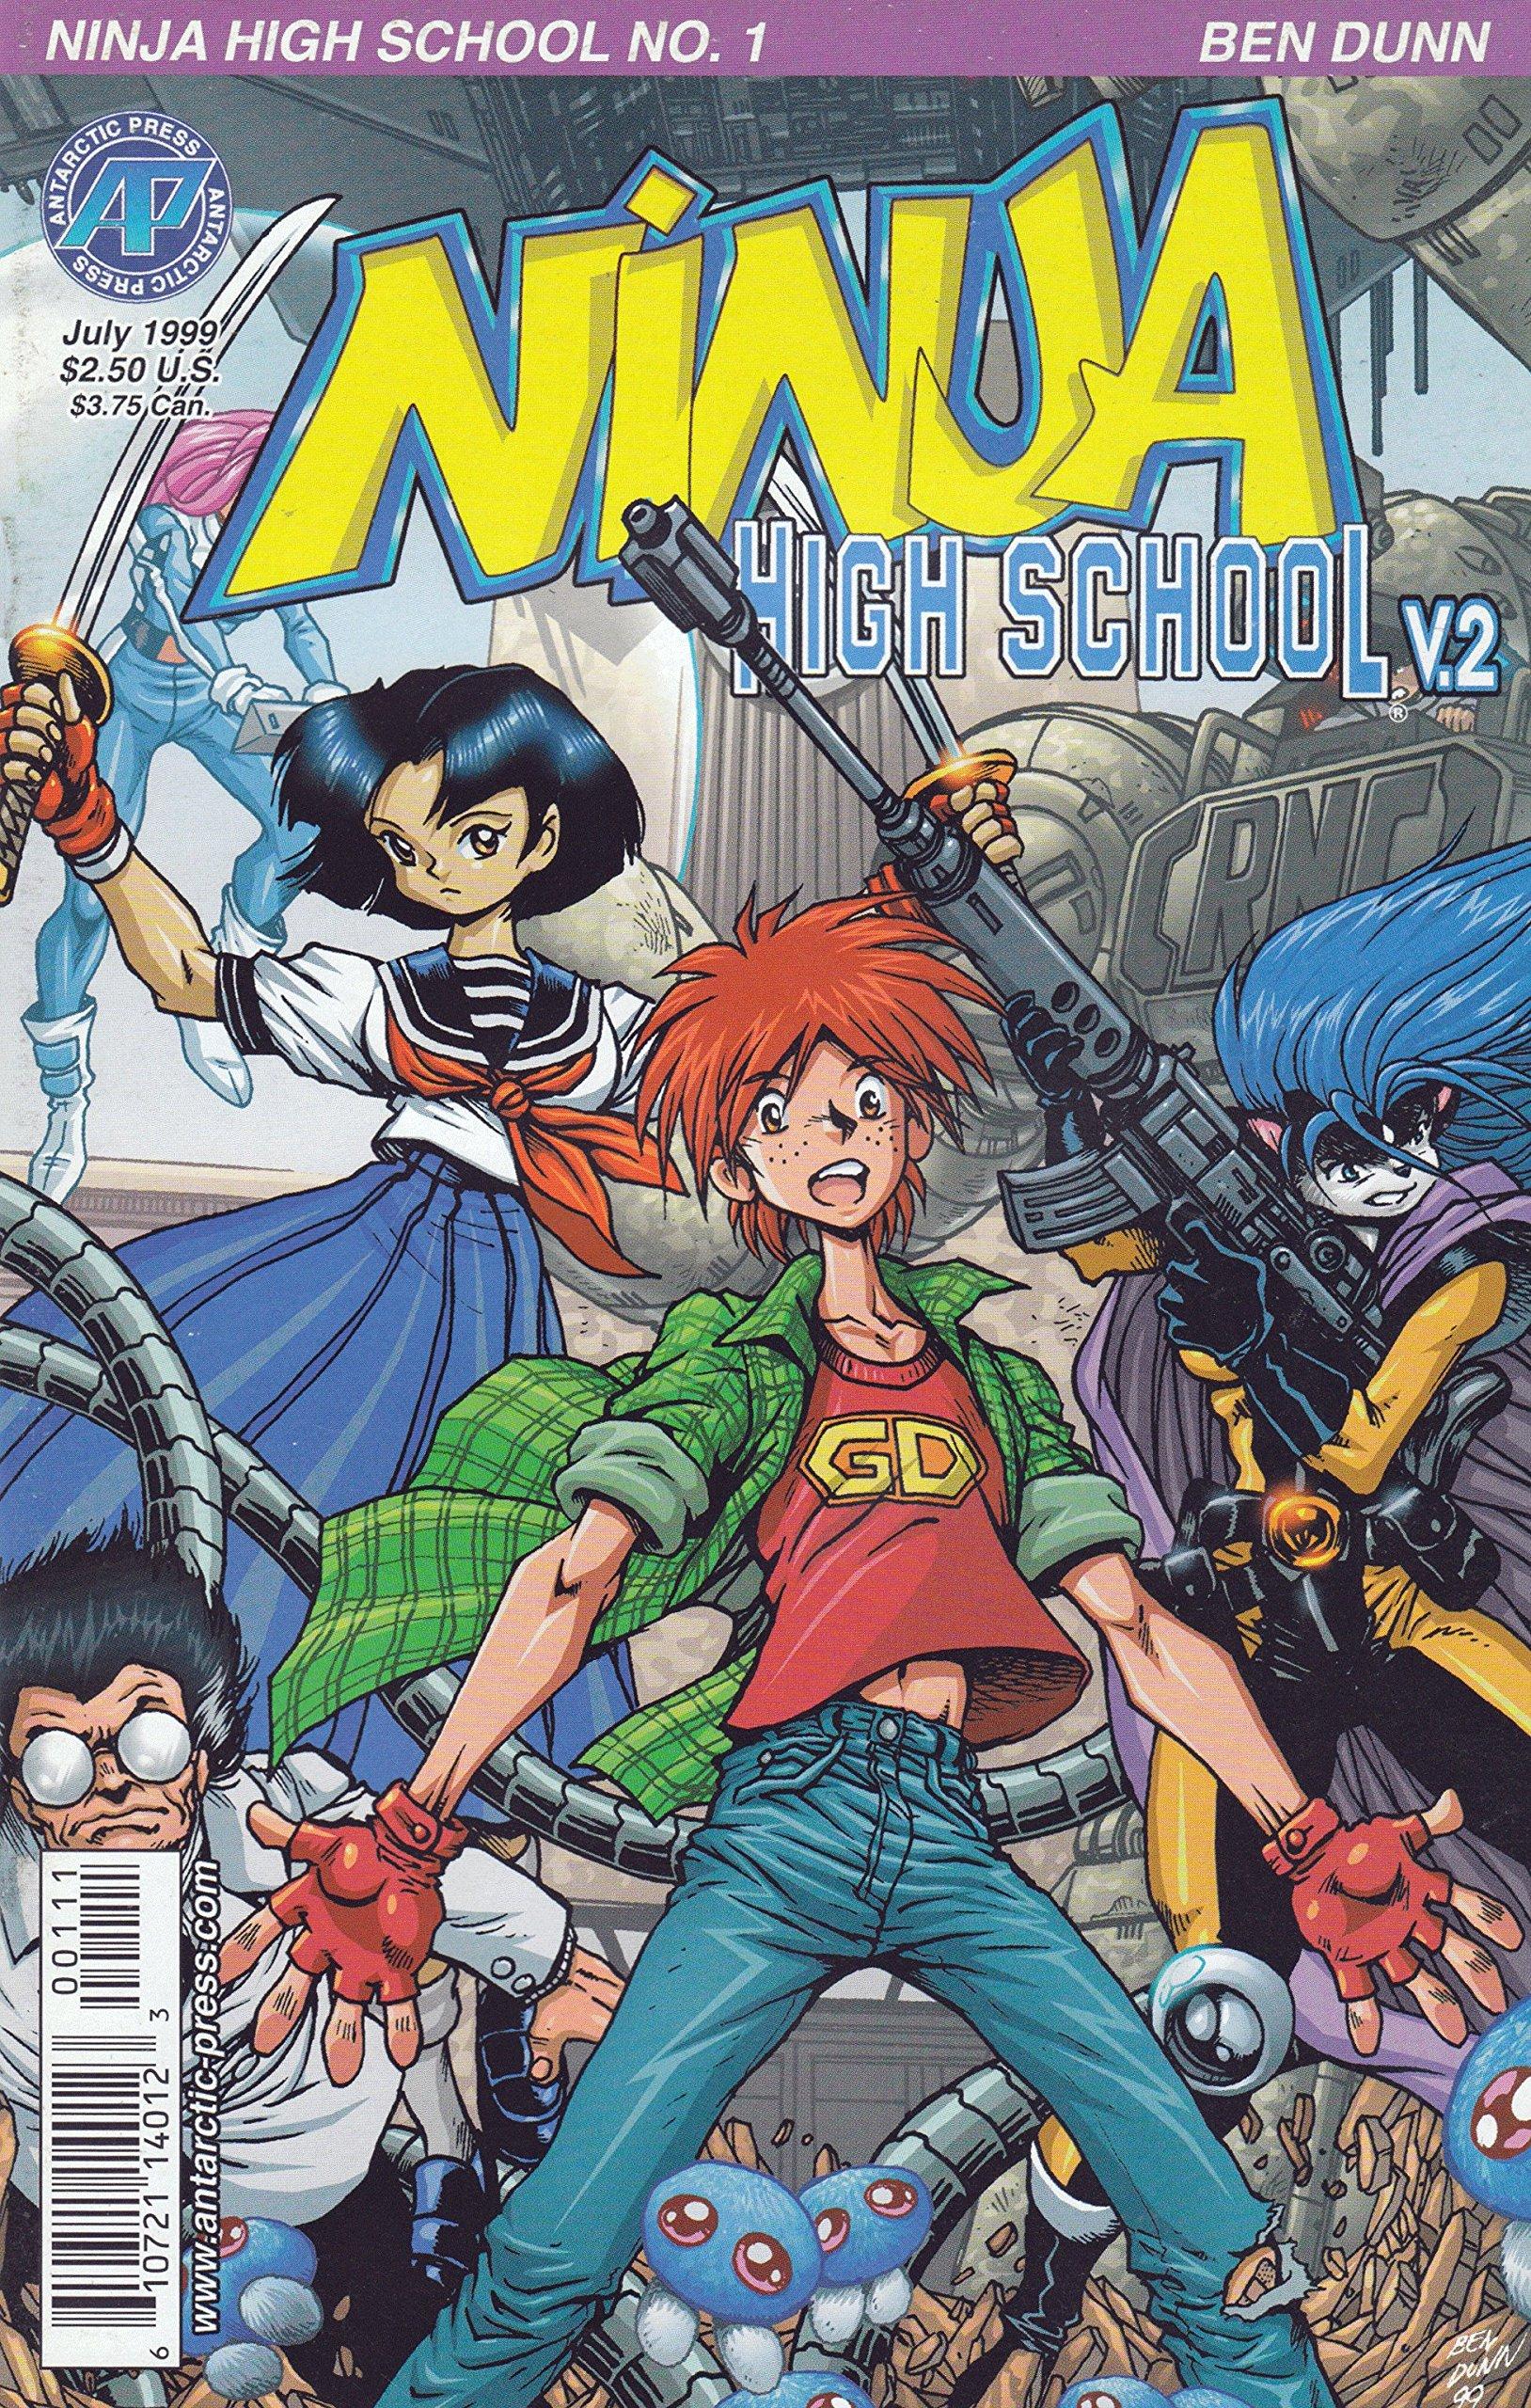 Ninja High School Comic # 1 - Antarctic Press, Volume # 2 ...